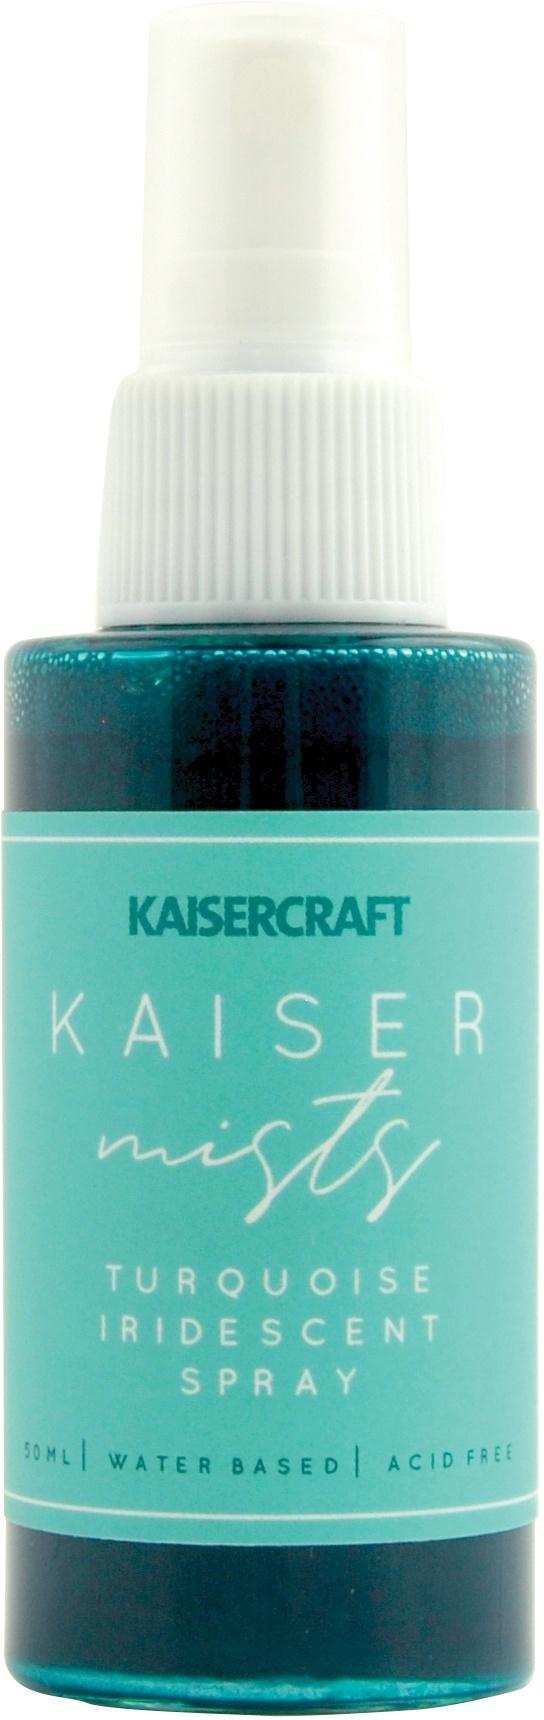 KaiserMists Iridescent Ink Spray 1.5oz-Turquoise